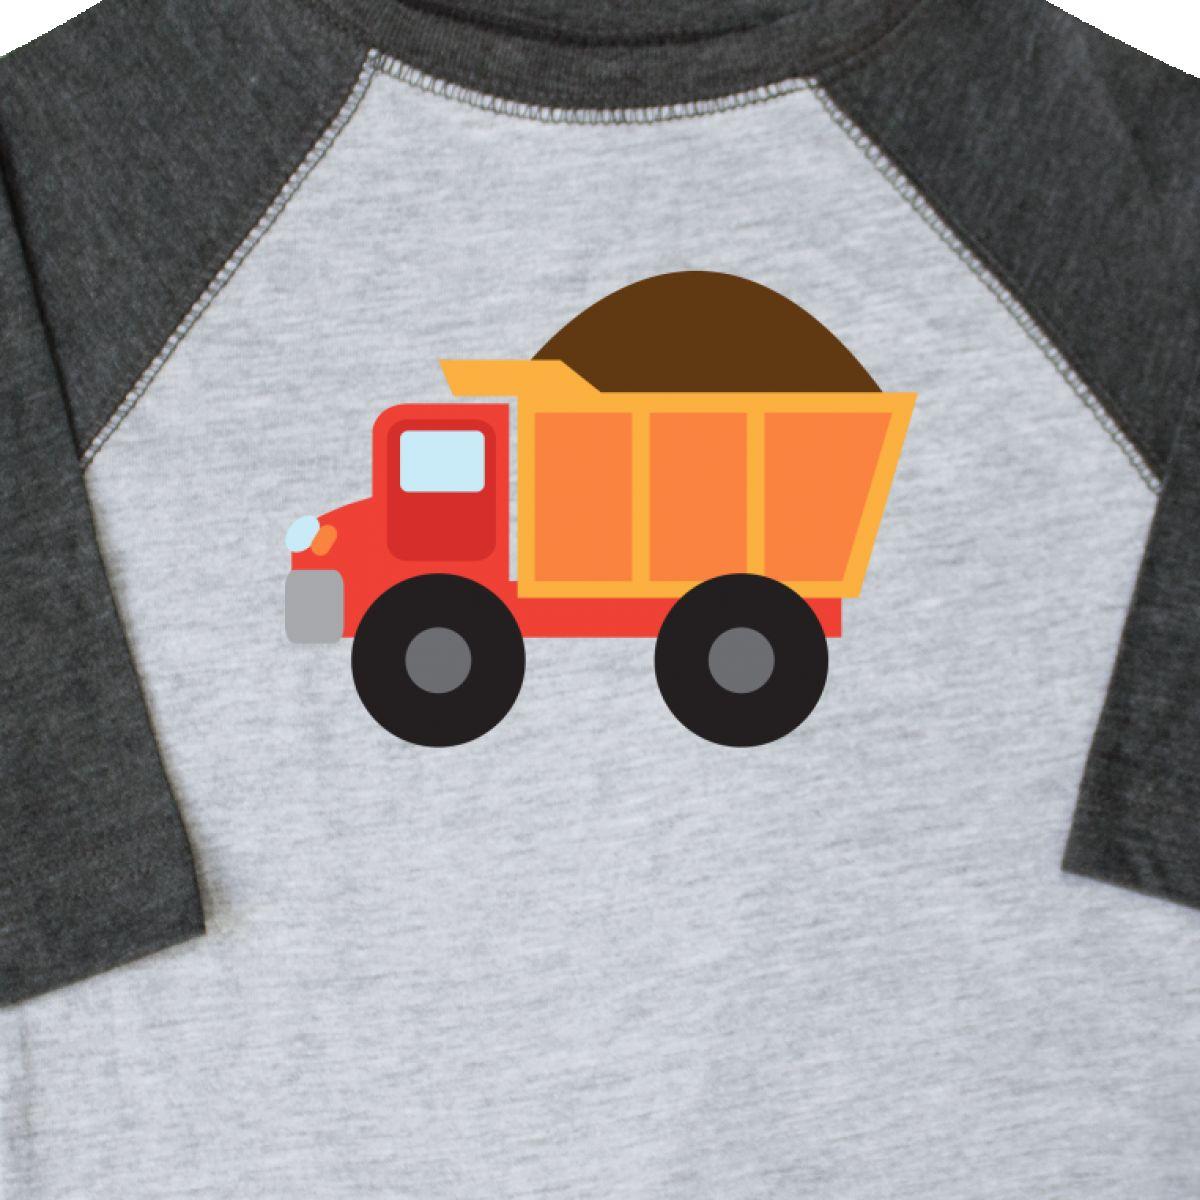 Inktastic-Work-Truck-Construction-Vehicle-Toddler-T-Shirt-Trucks-Vehicles-Cute thumbnail 4